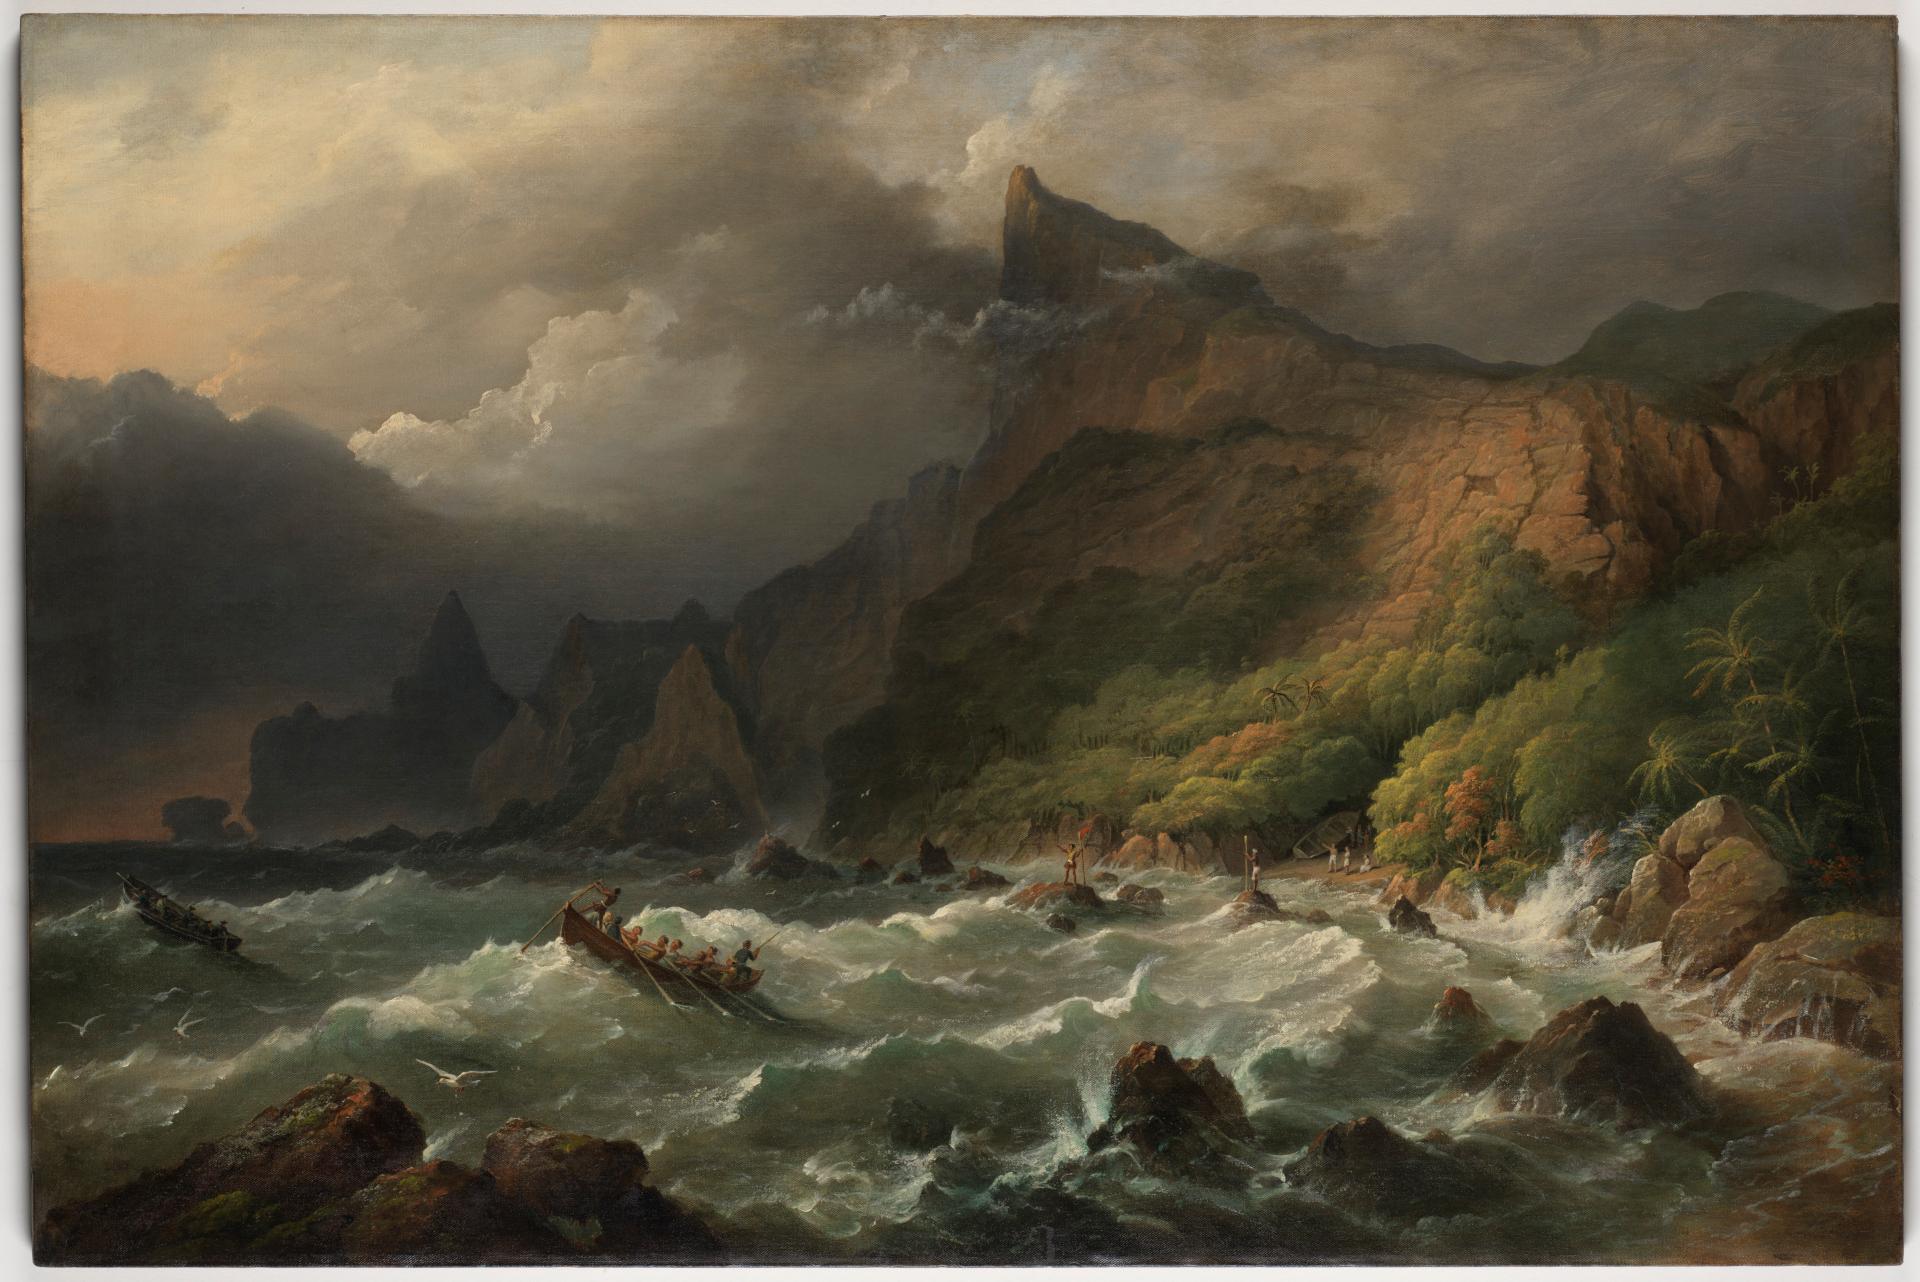 Landing in Bounty Bay, 1825? / Frederick William Beechey